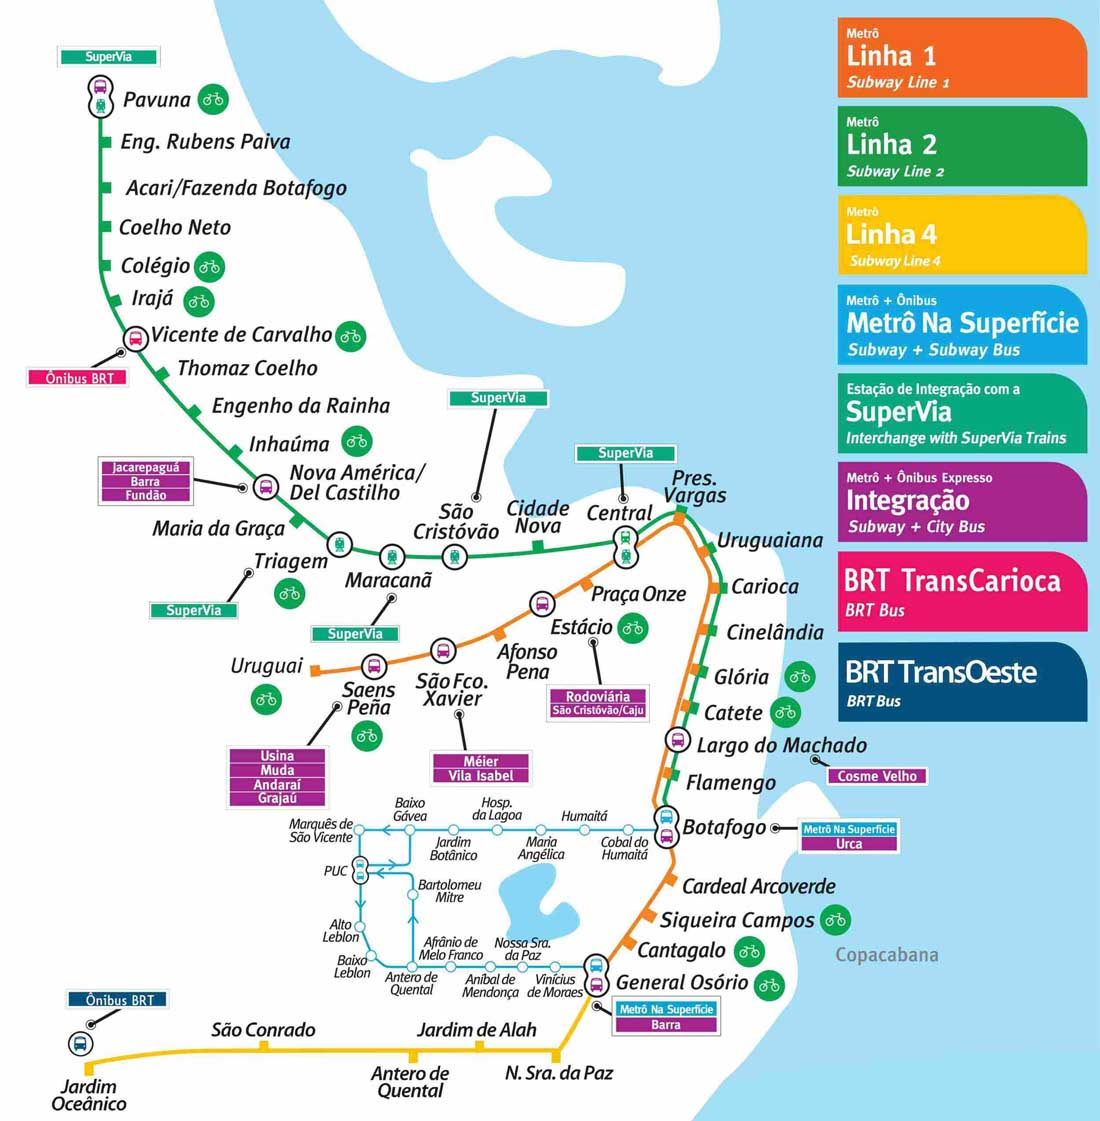 Rio de Janeiro metro haritası